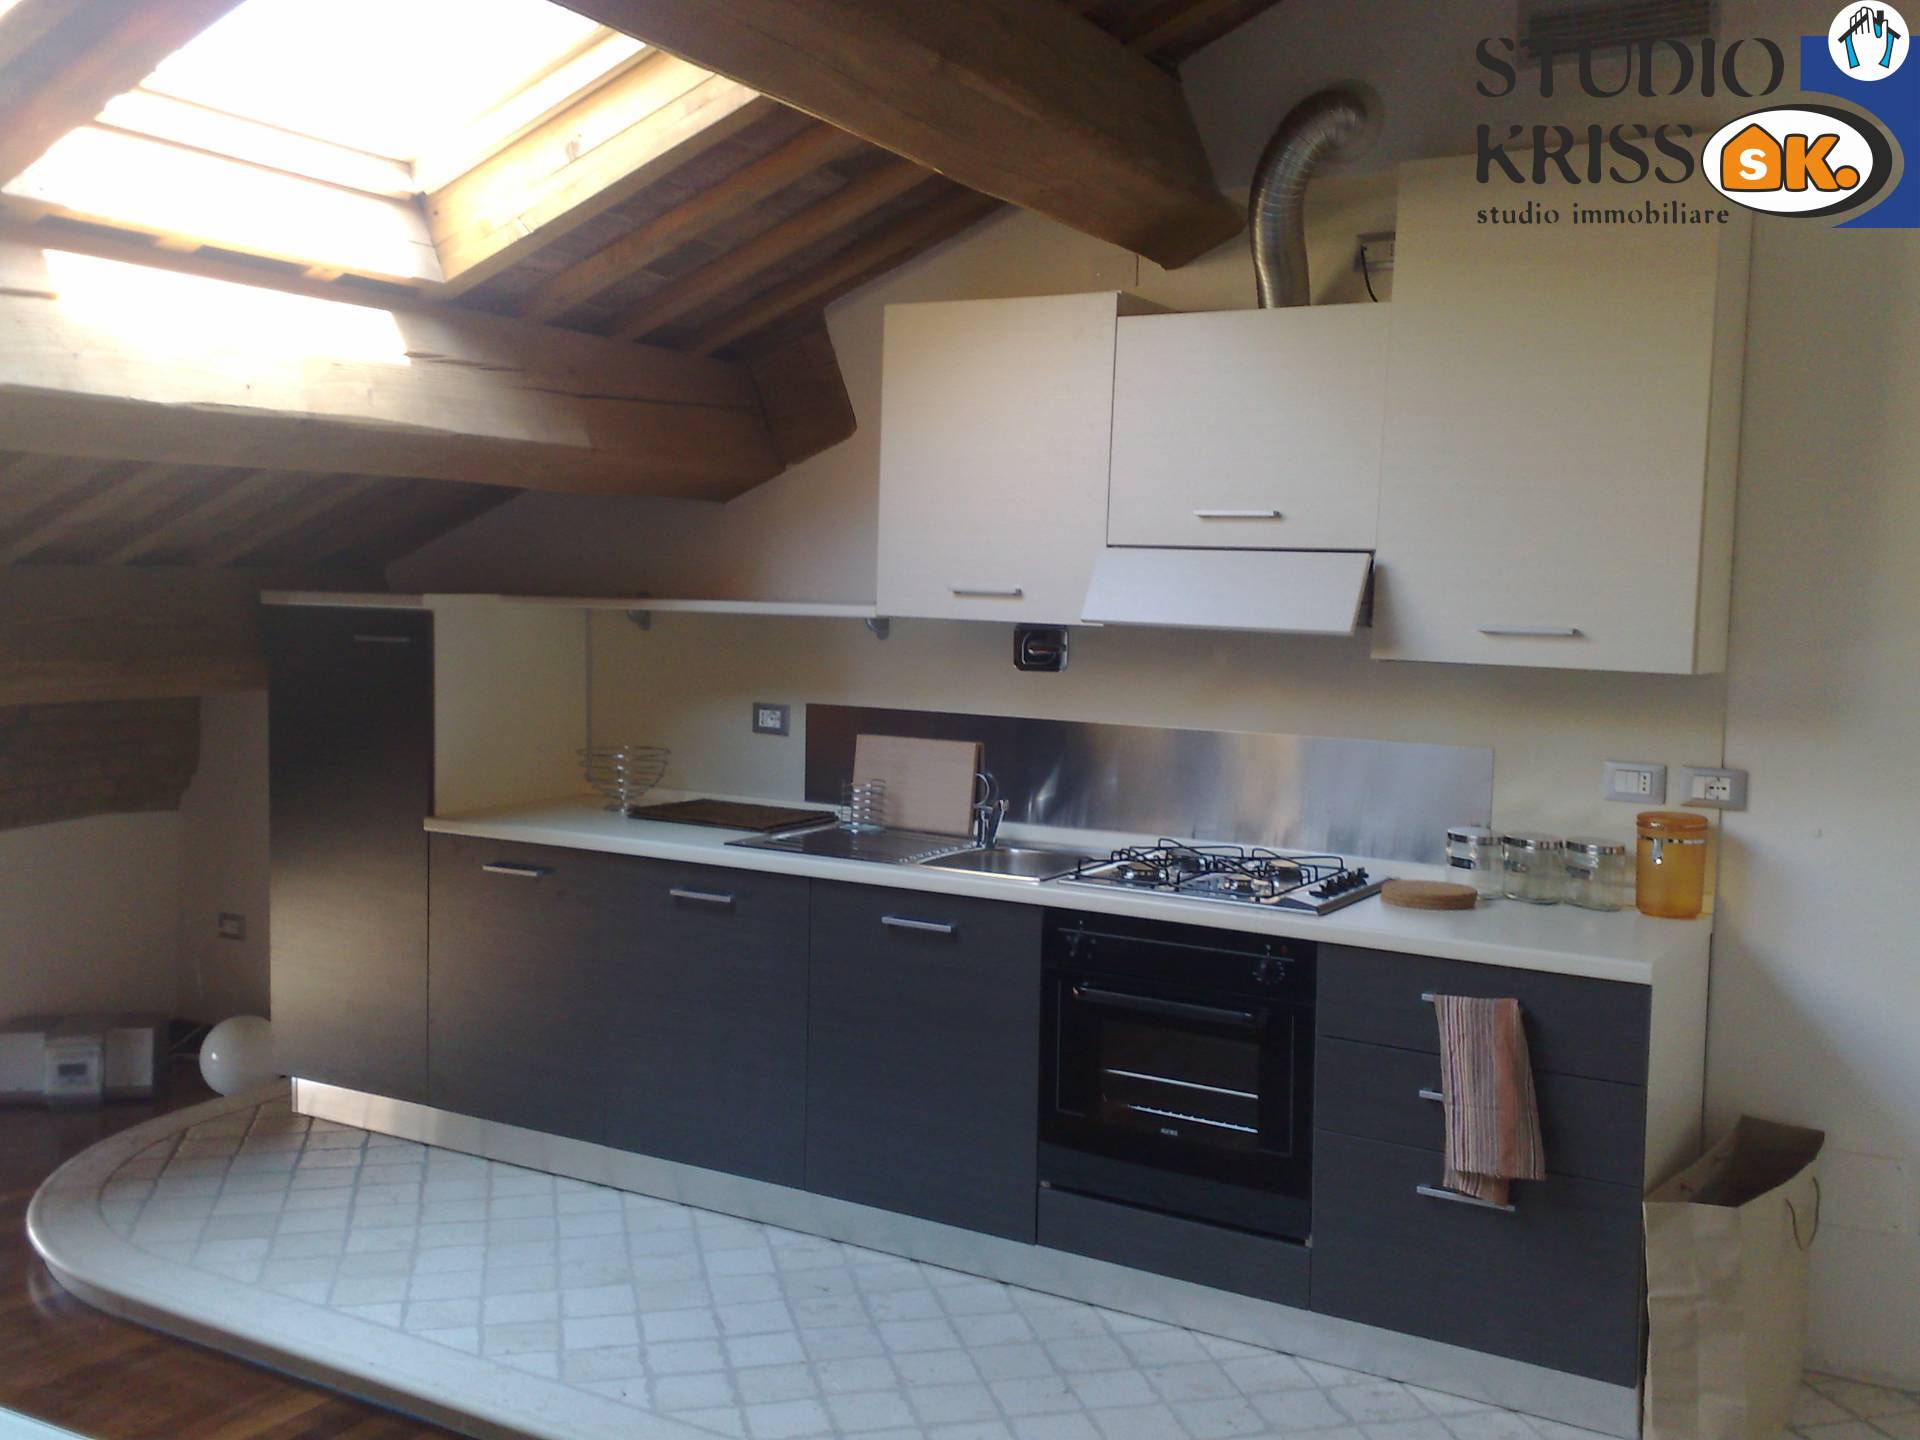 Appartamento in Vendita a Ferrara: 2 locali, 60 mq - Foto 1